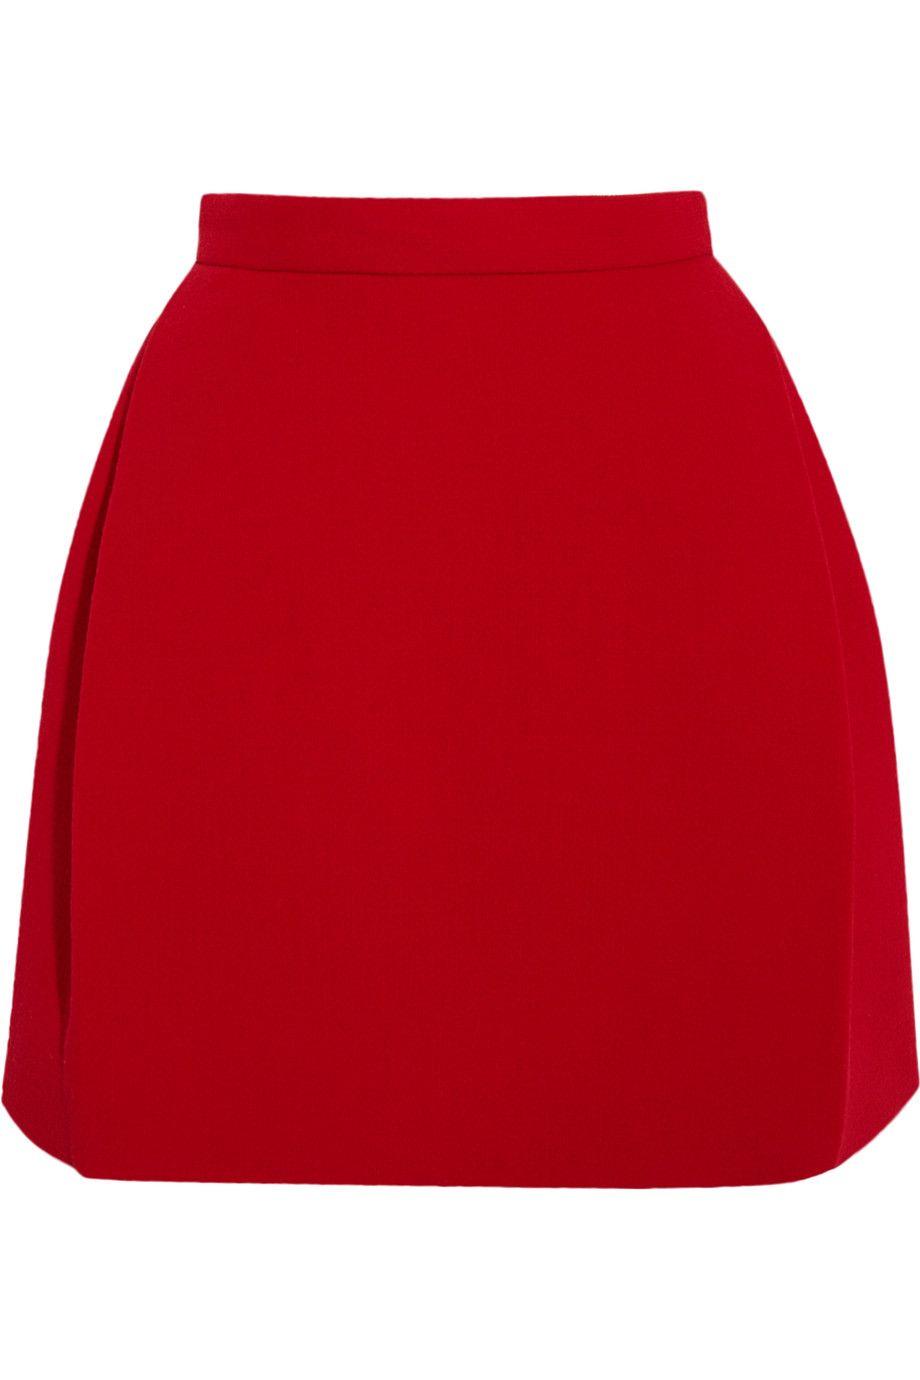 DELPOZO Wool-Blend Crepe Mini Skirt. #delpozo #cloth #skirt